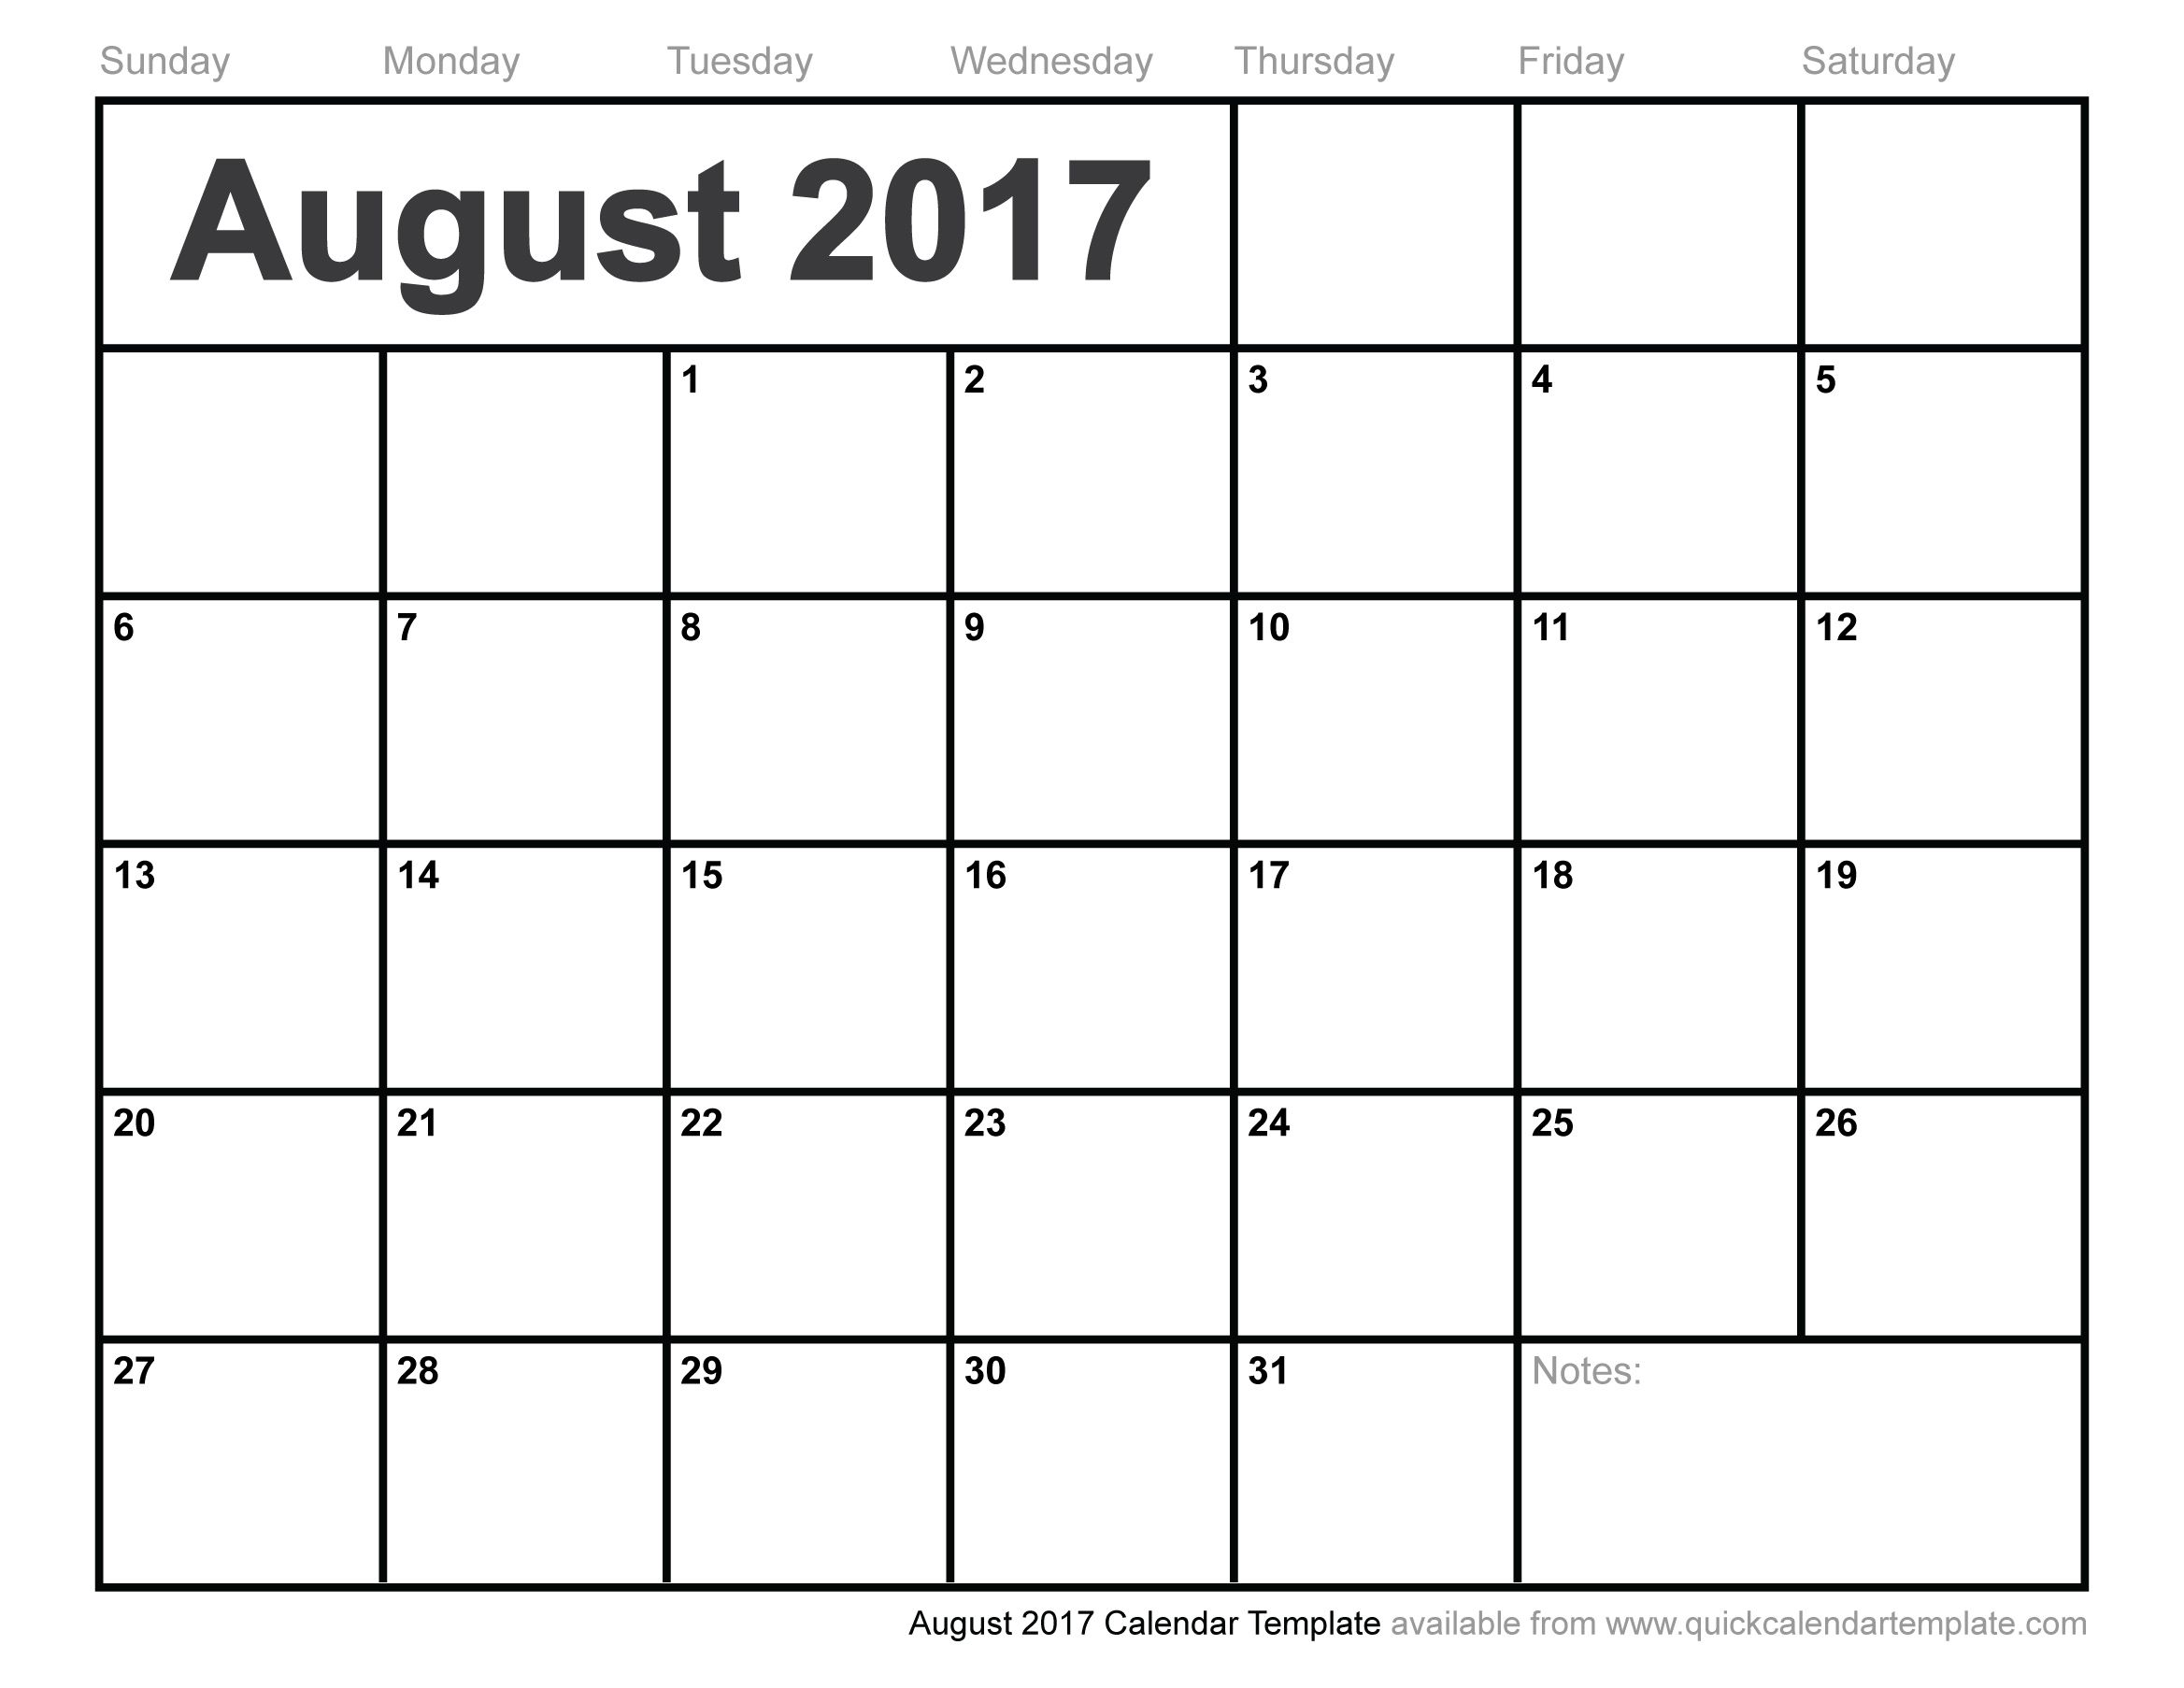 2017 calendar by month template